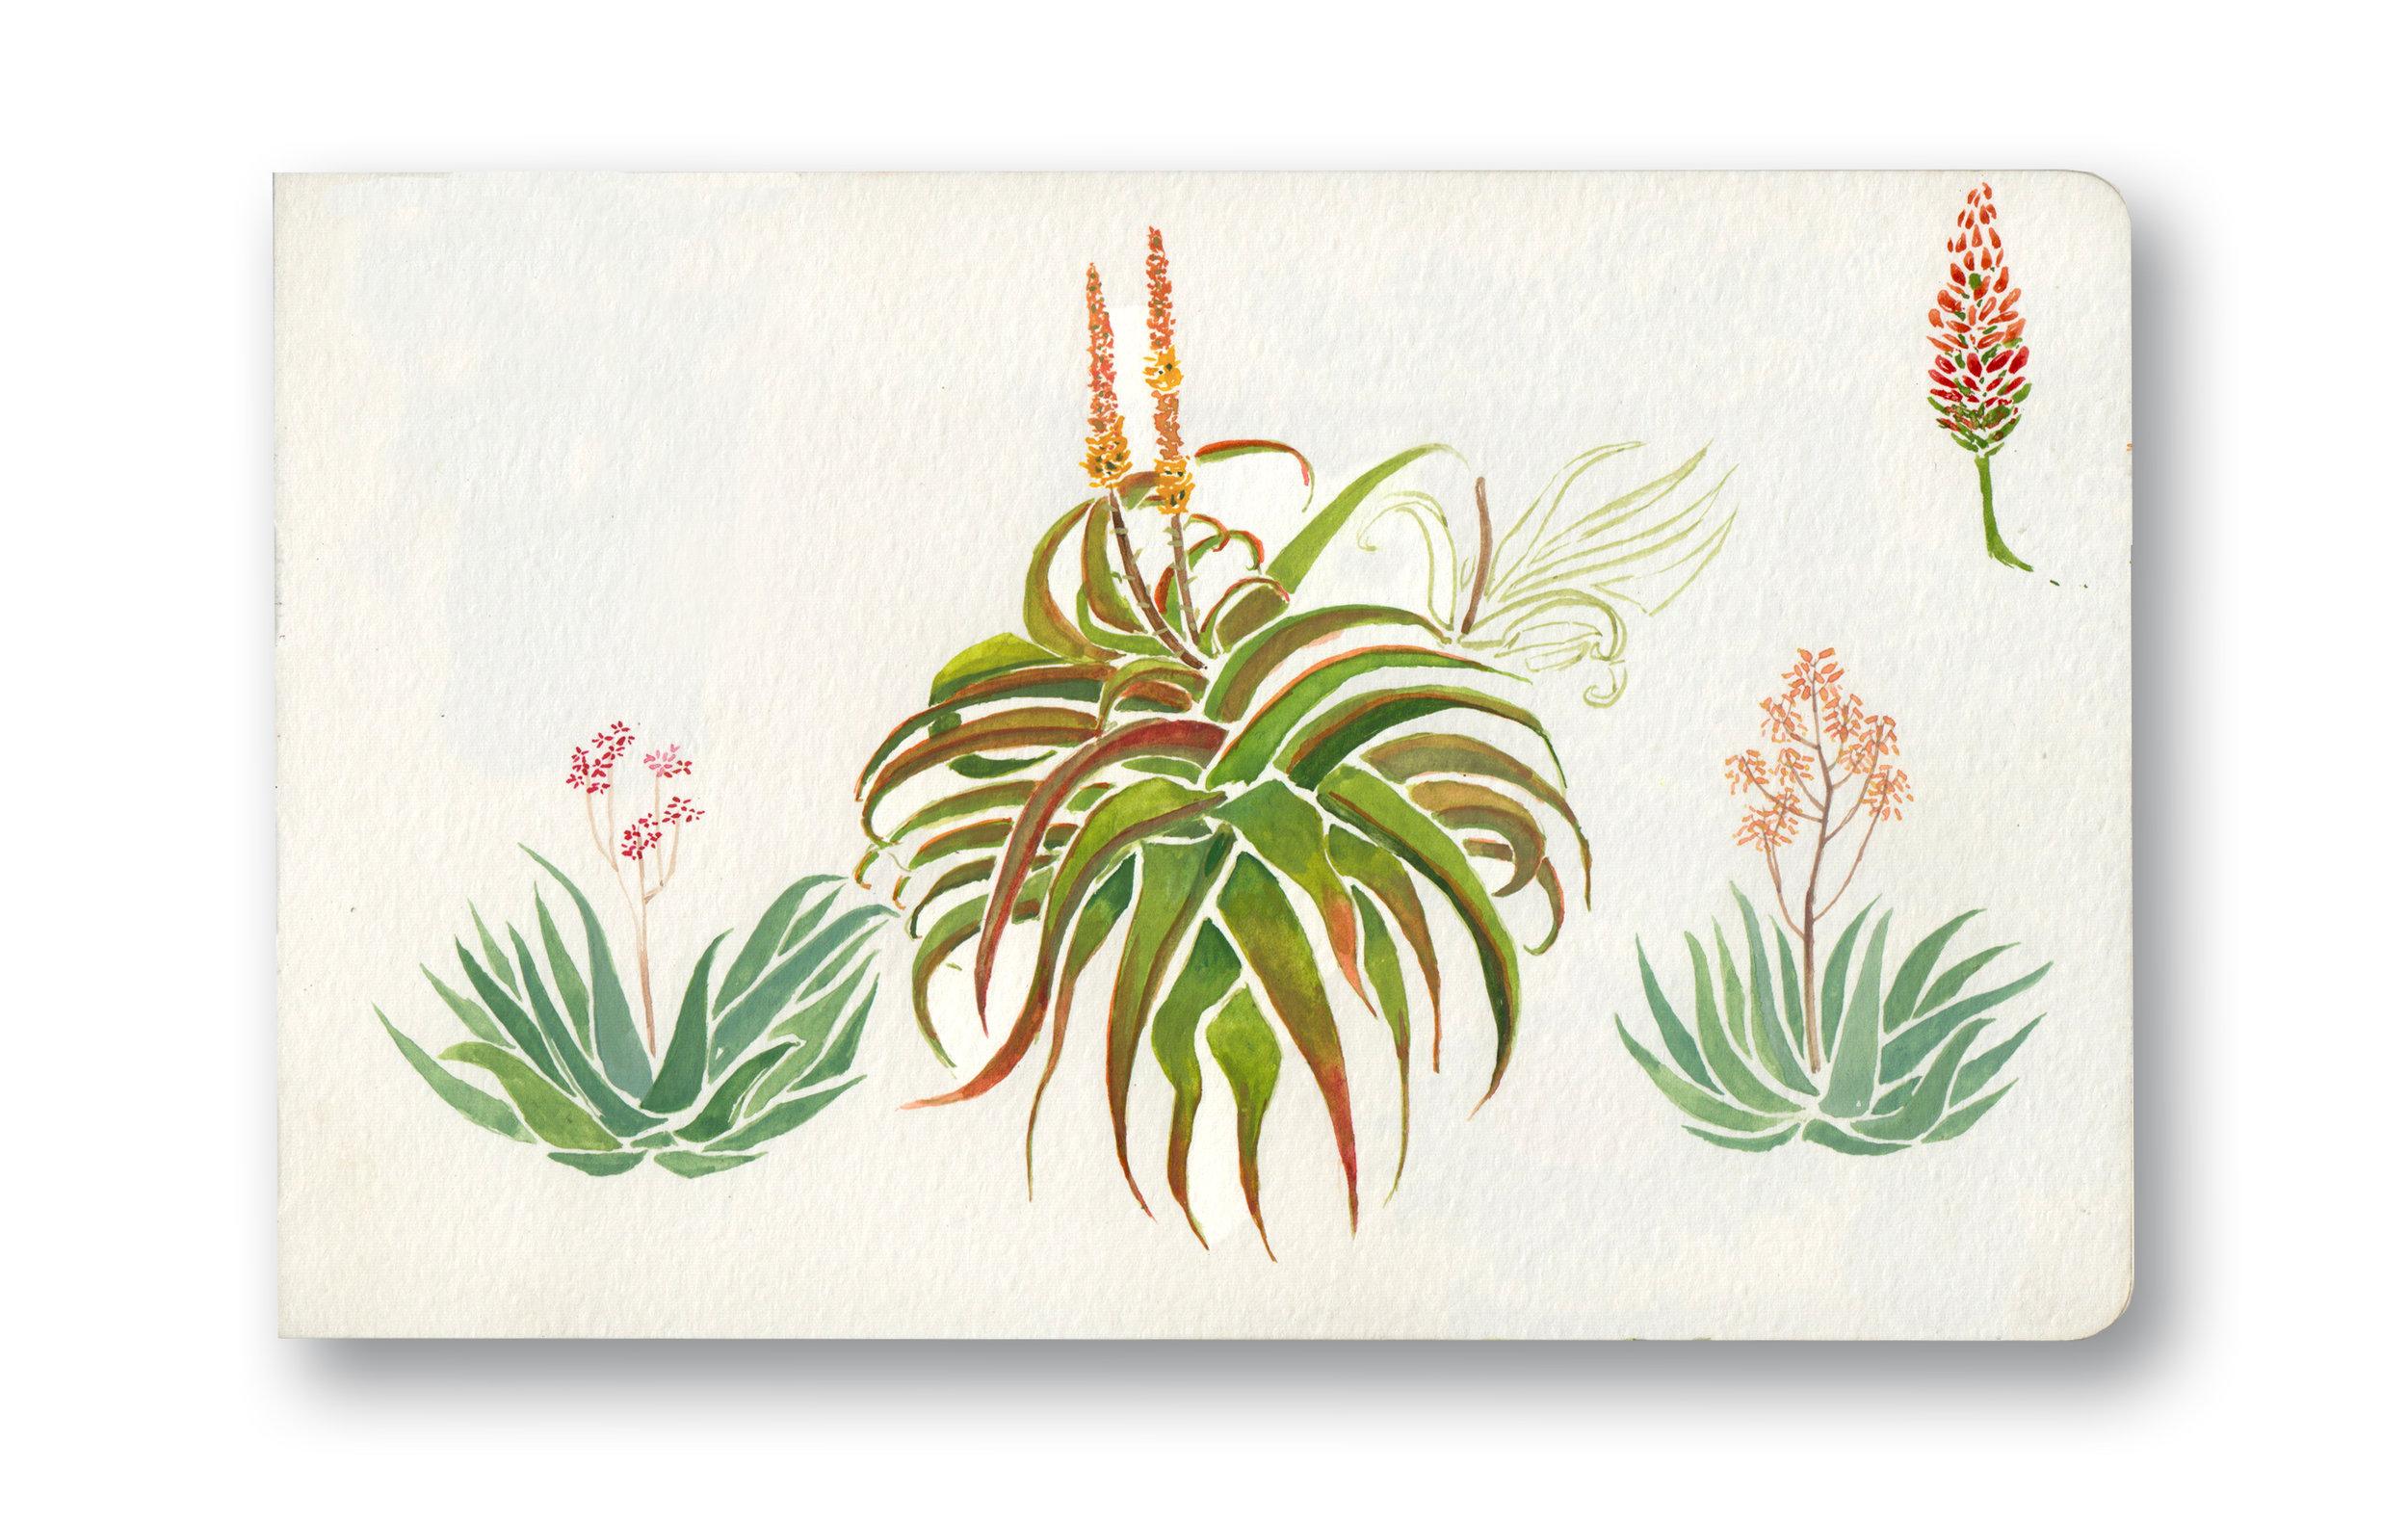 "Gran's Aloes - Durban, Sa  Watercolor & Gouache - MOleskine Sketchbook 5 x 8.25"""